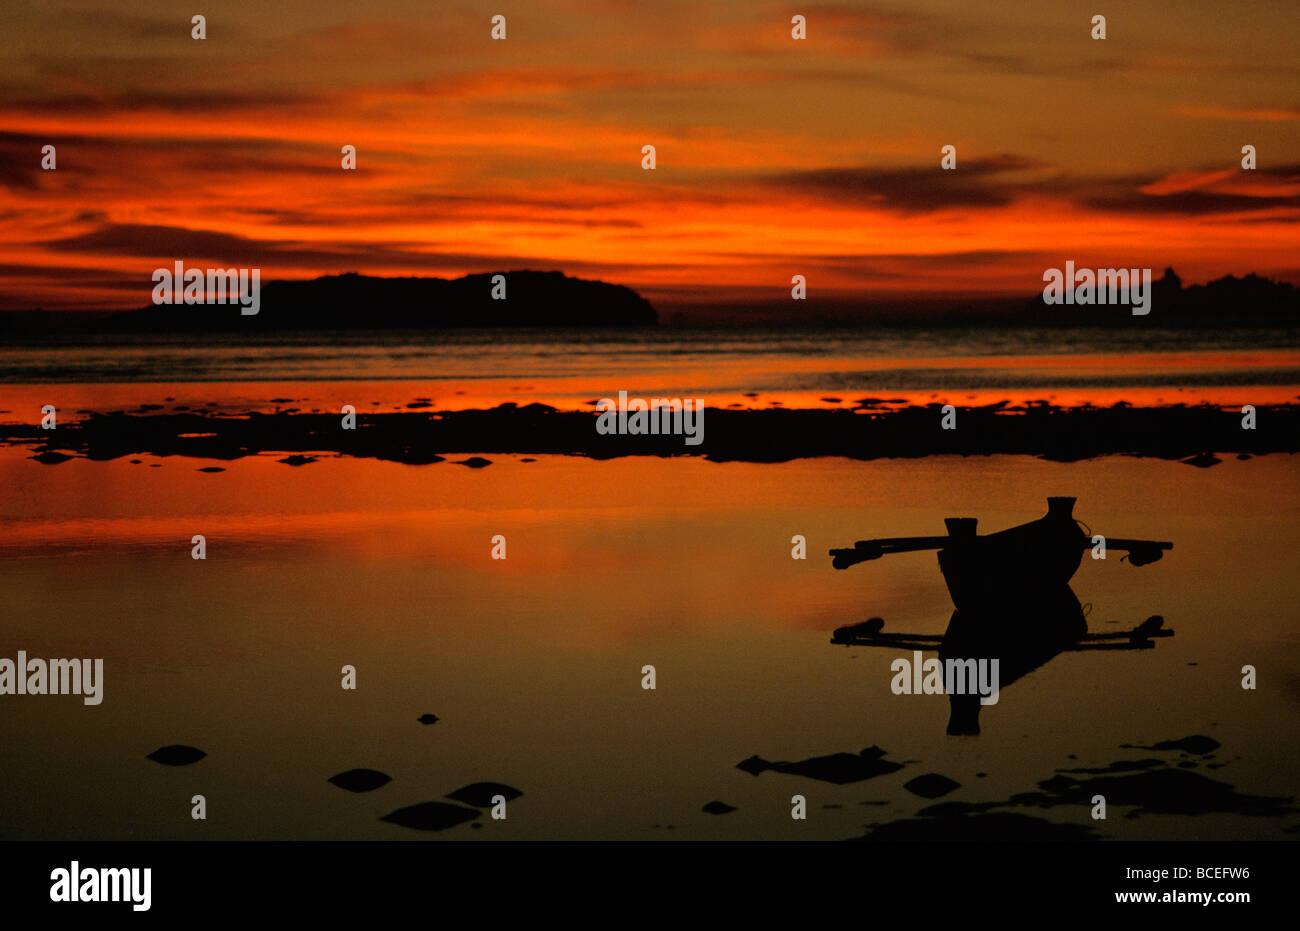 KOTA KINABALU  MALAYSIA , SUNSET ON SEA WITH CANOE - Stock Image